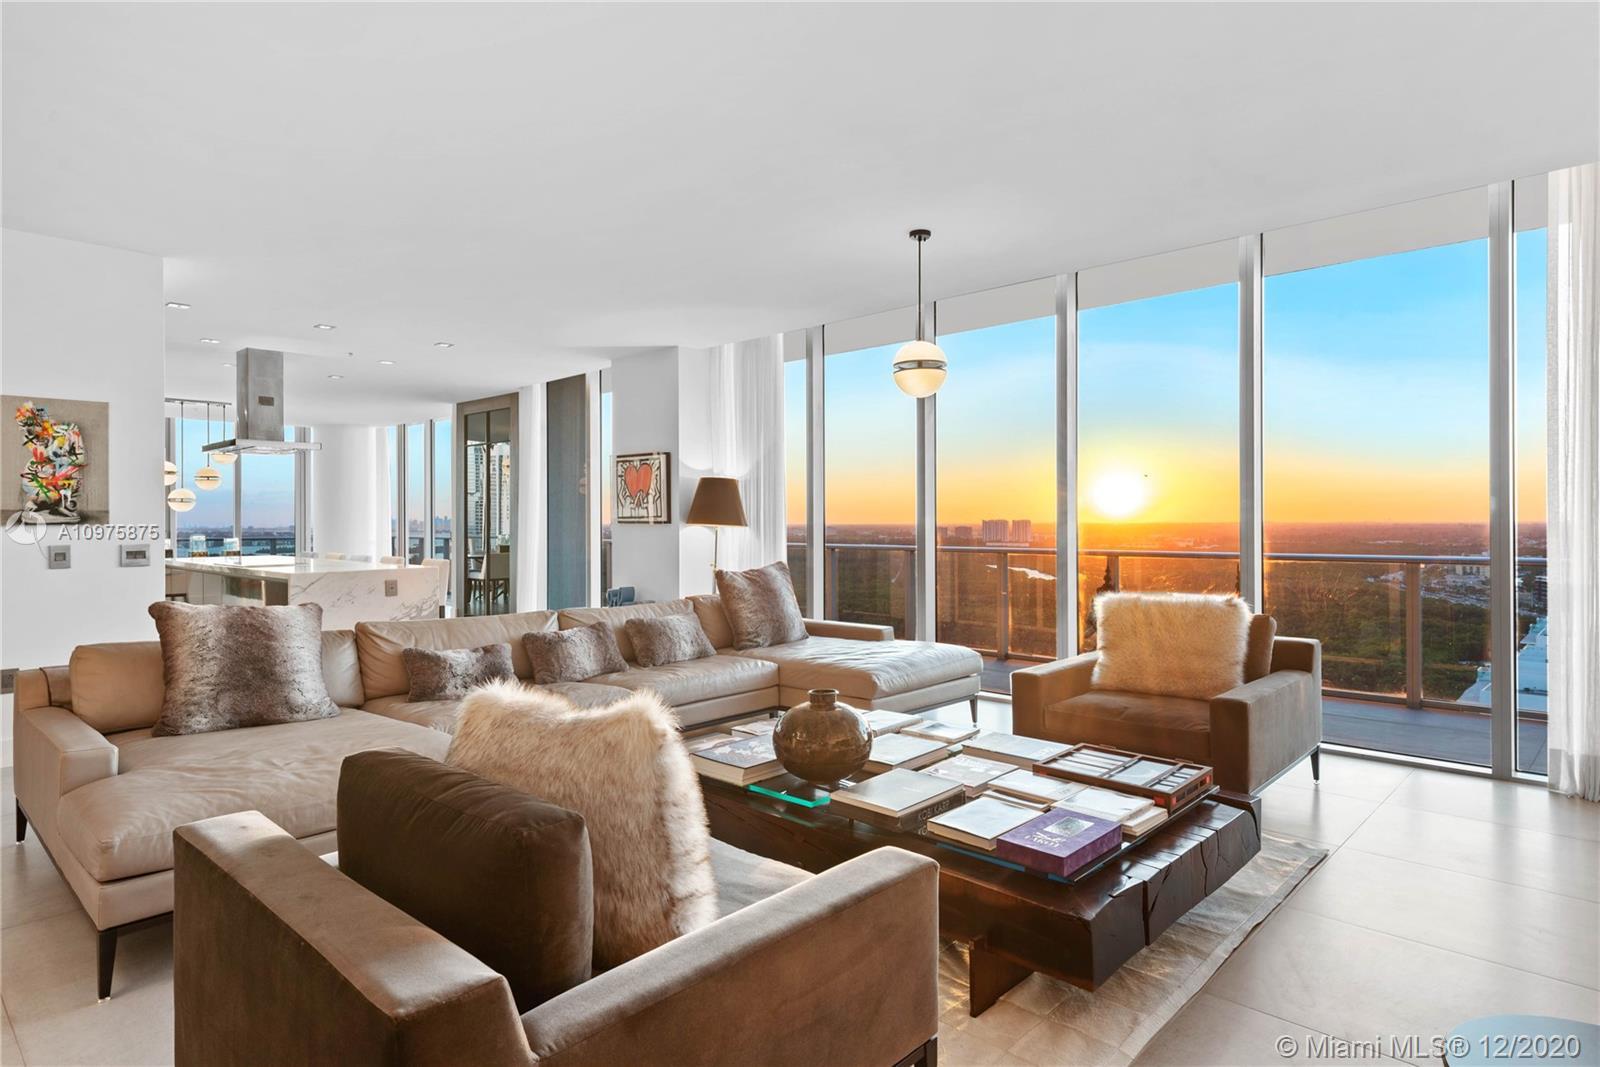 330 Sunny Isles Blvd, Unit #5TS01 Luxury Real Estate